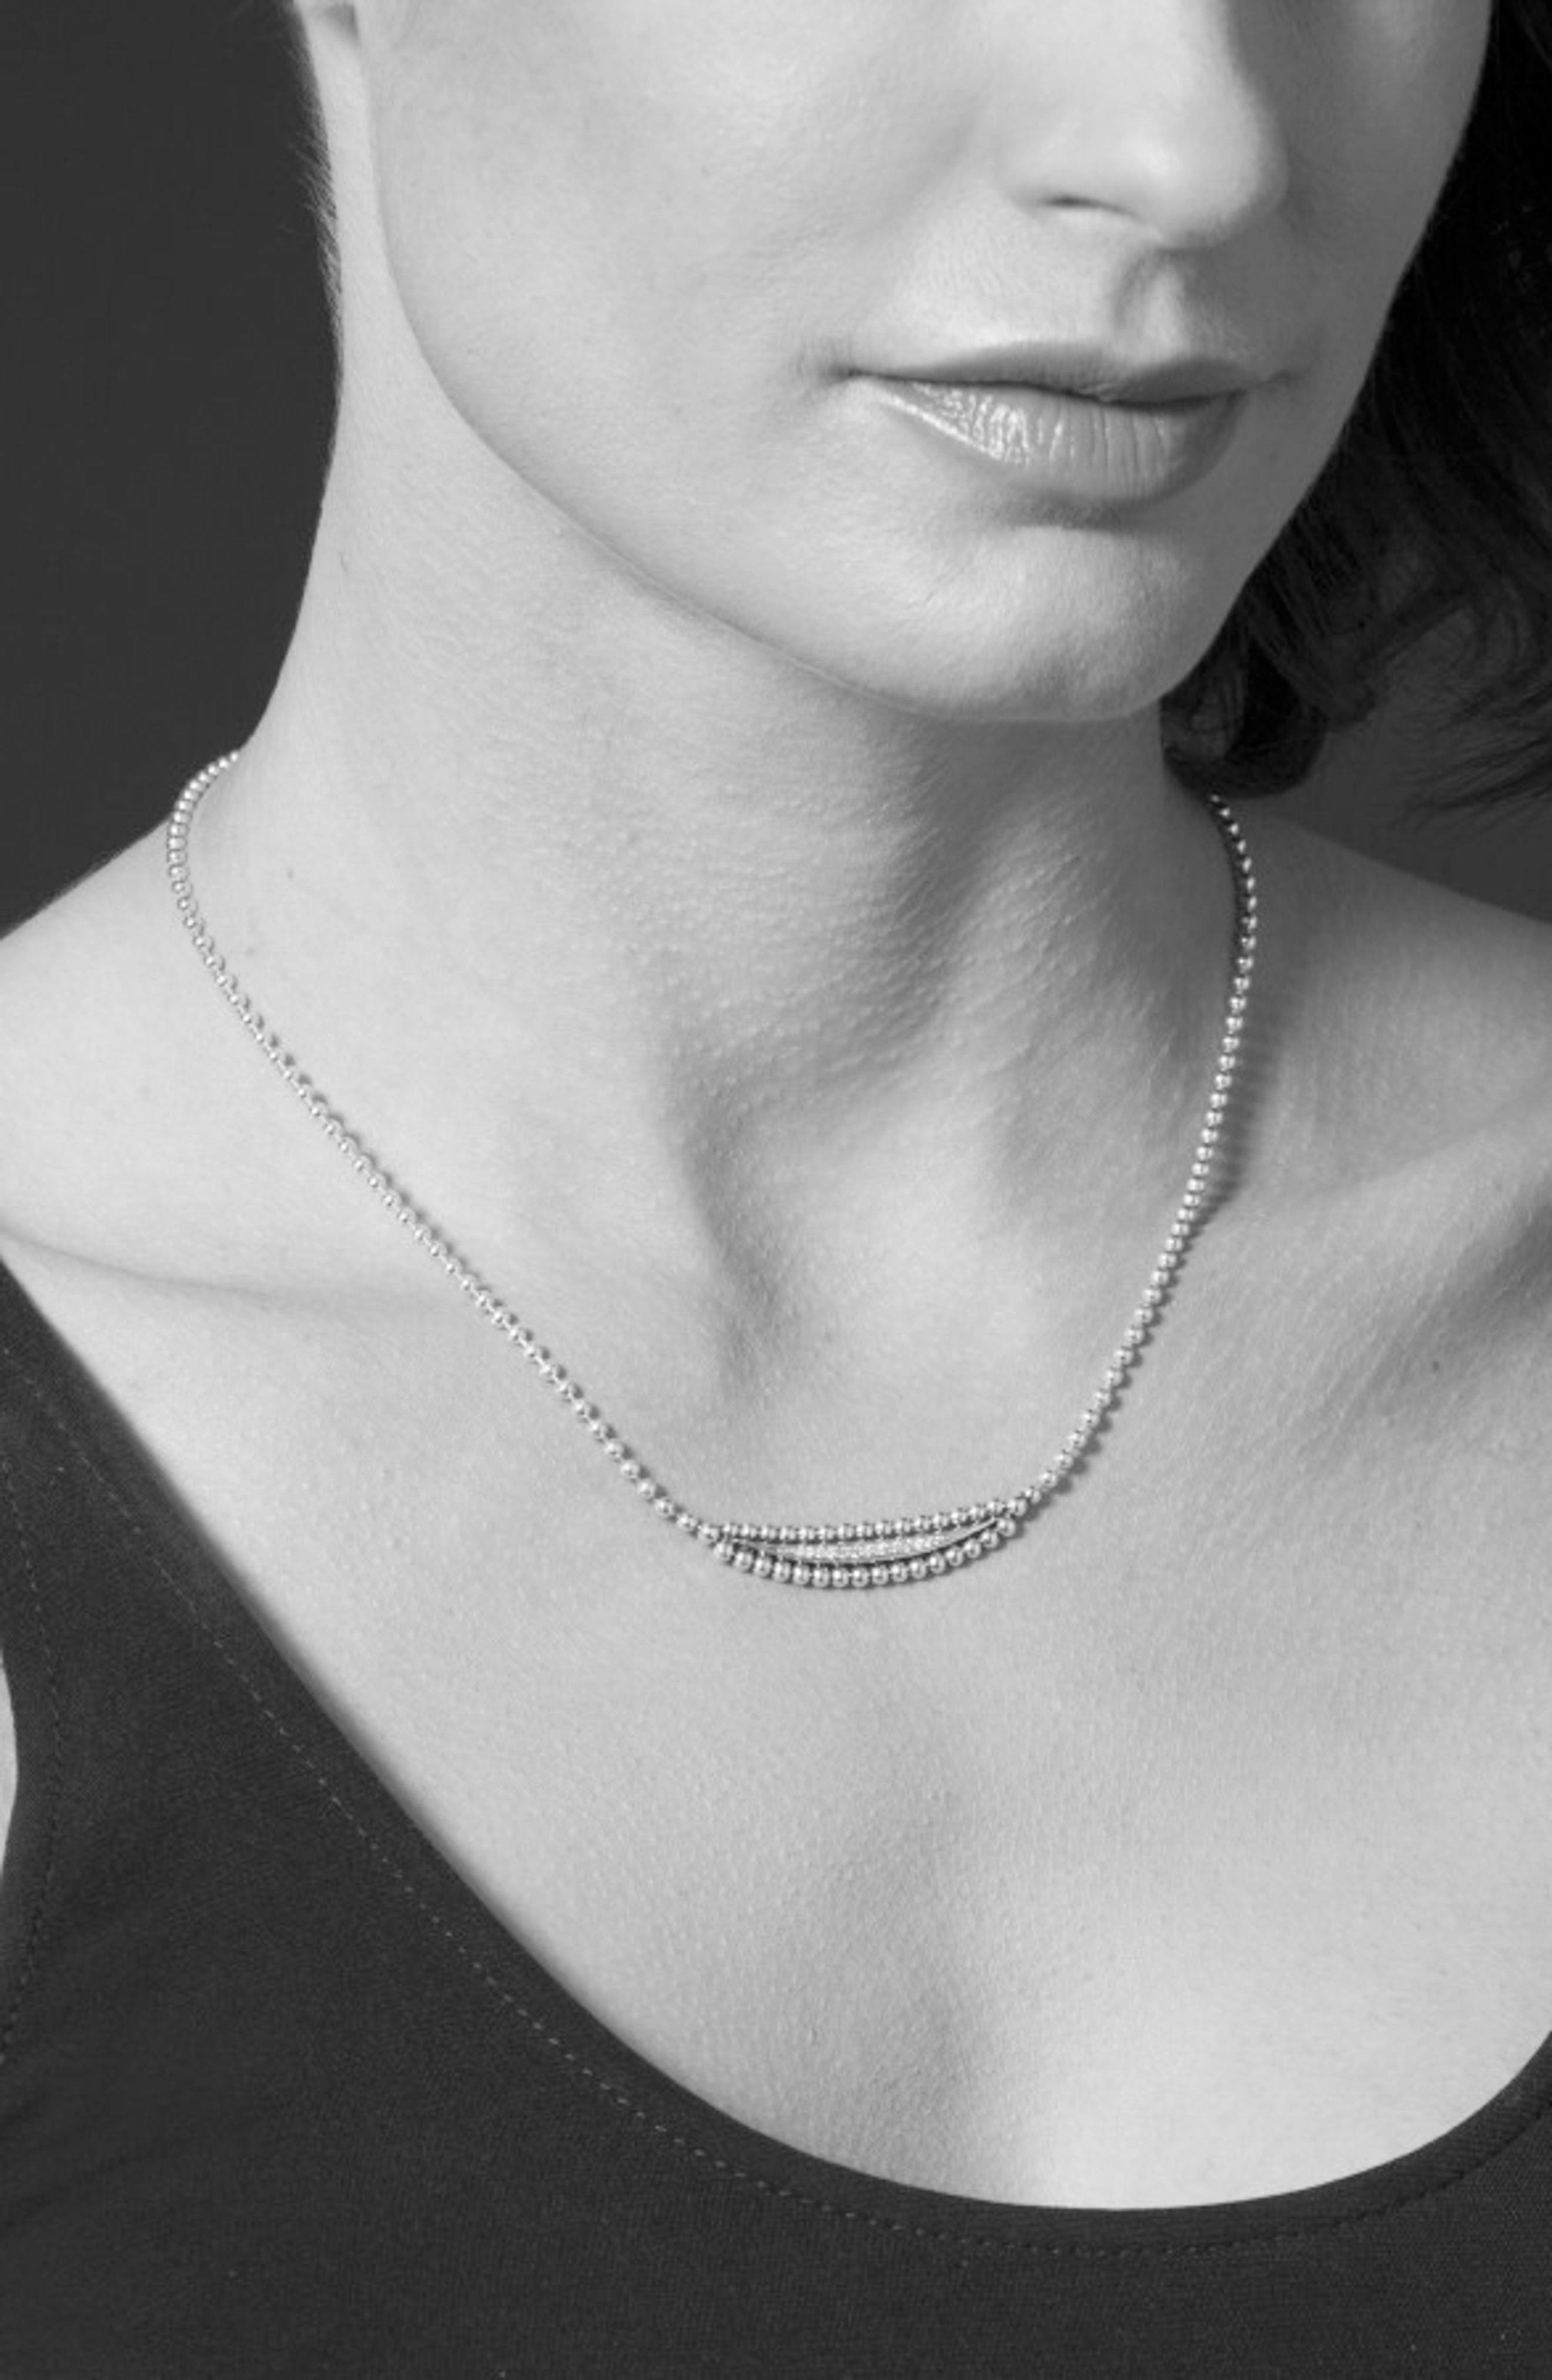 Caviar Spark Diamond Necklace,                             Alternate thumbnail 2, color,                             SILVER/ DIAMOND